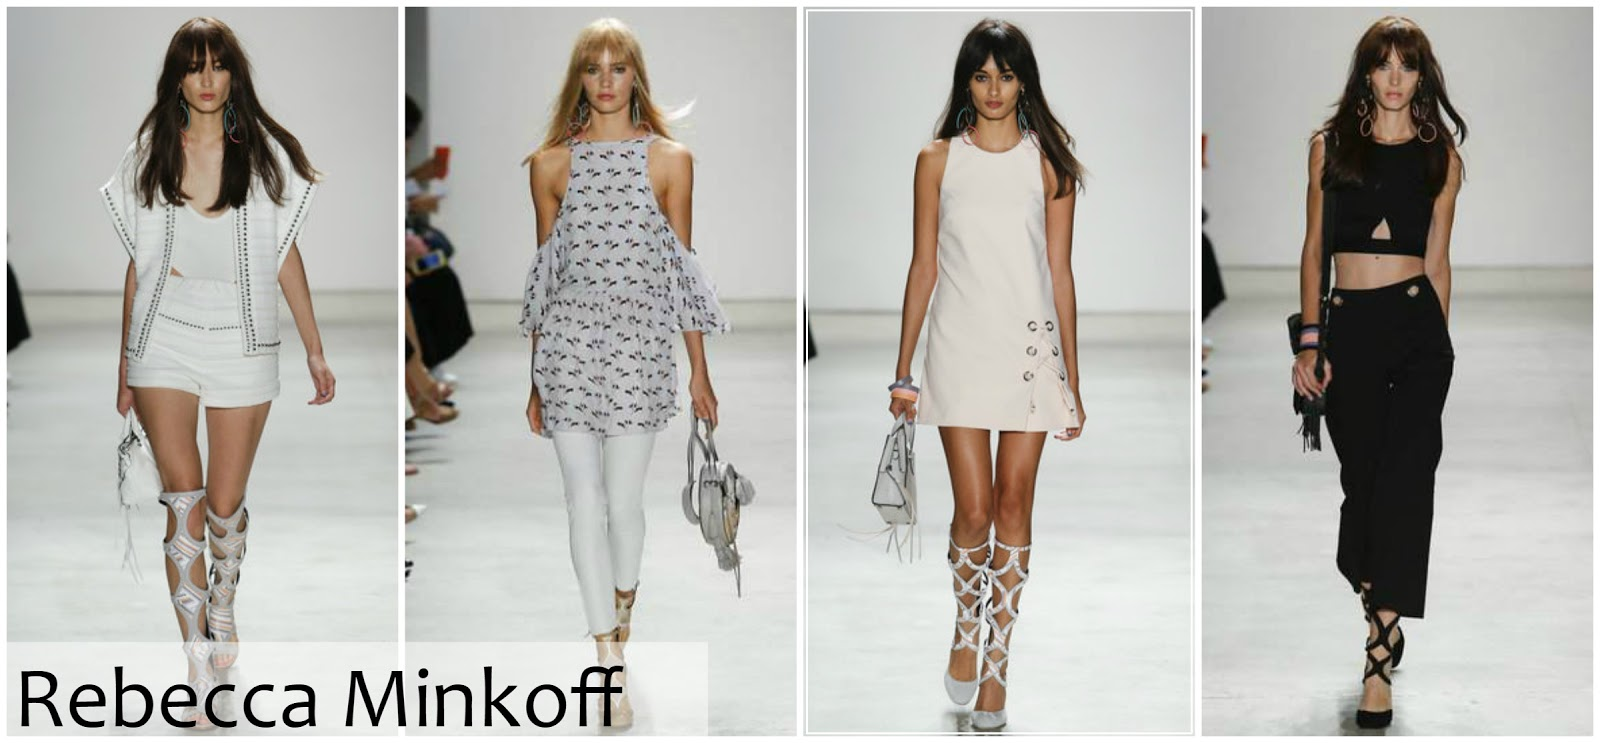 Rebecca Minkoff runway fashion